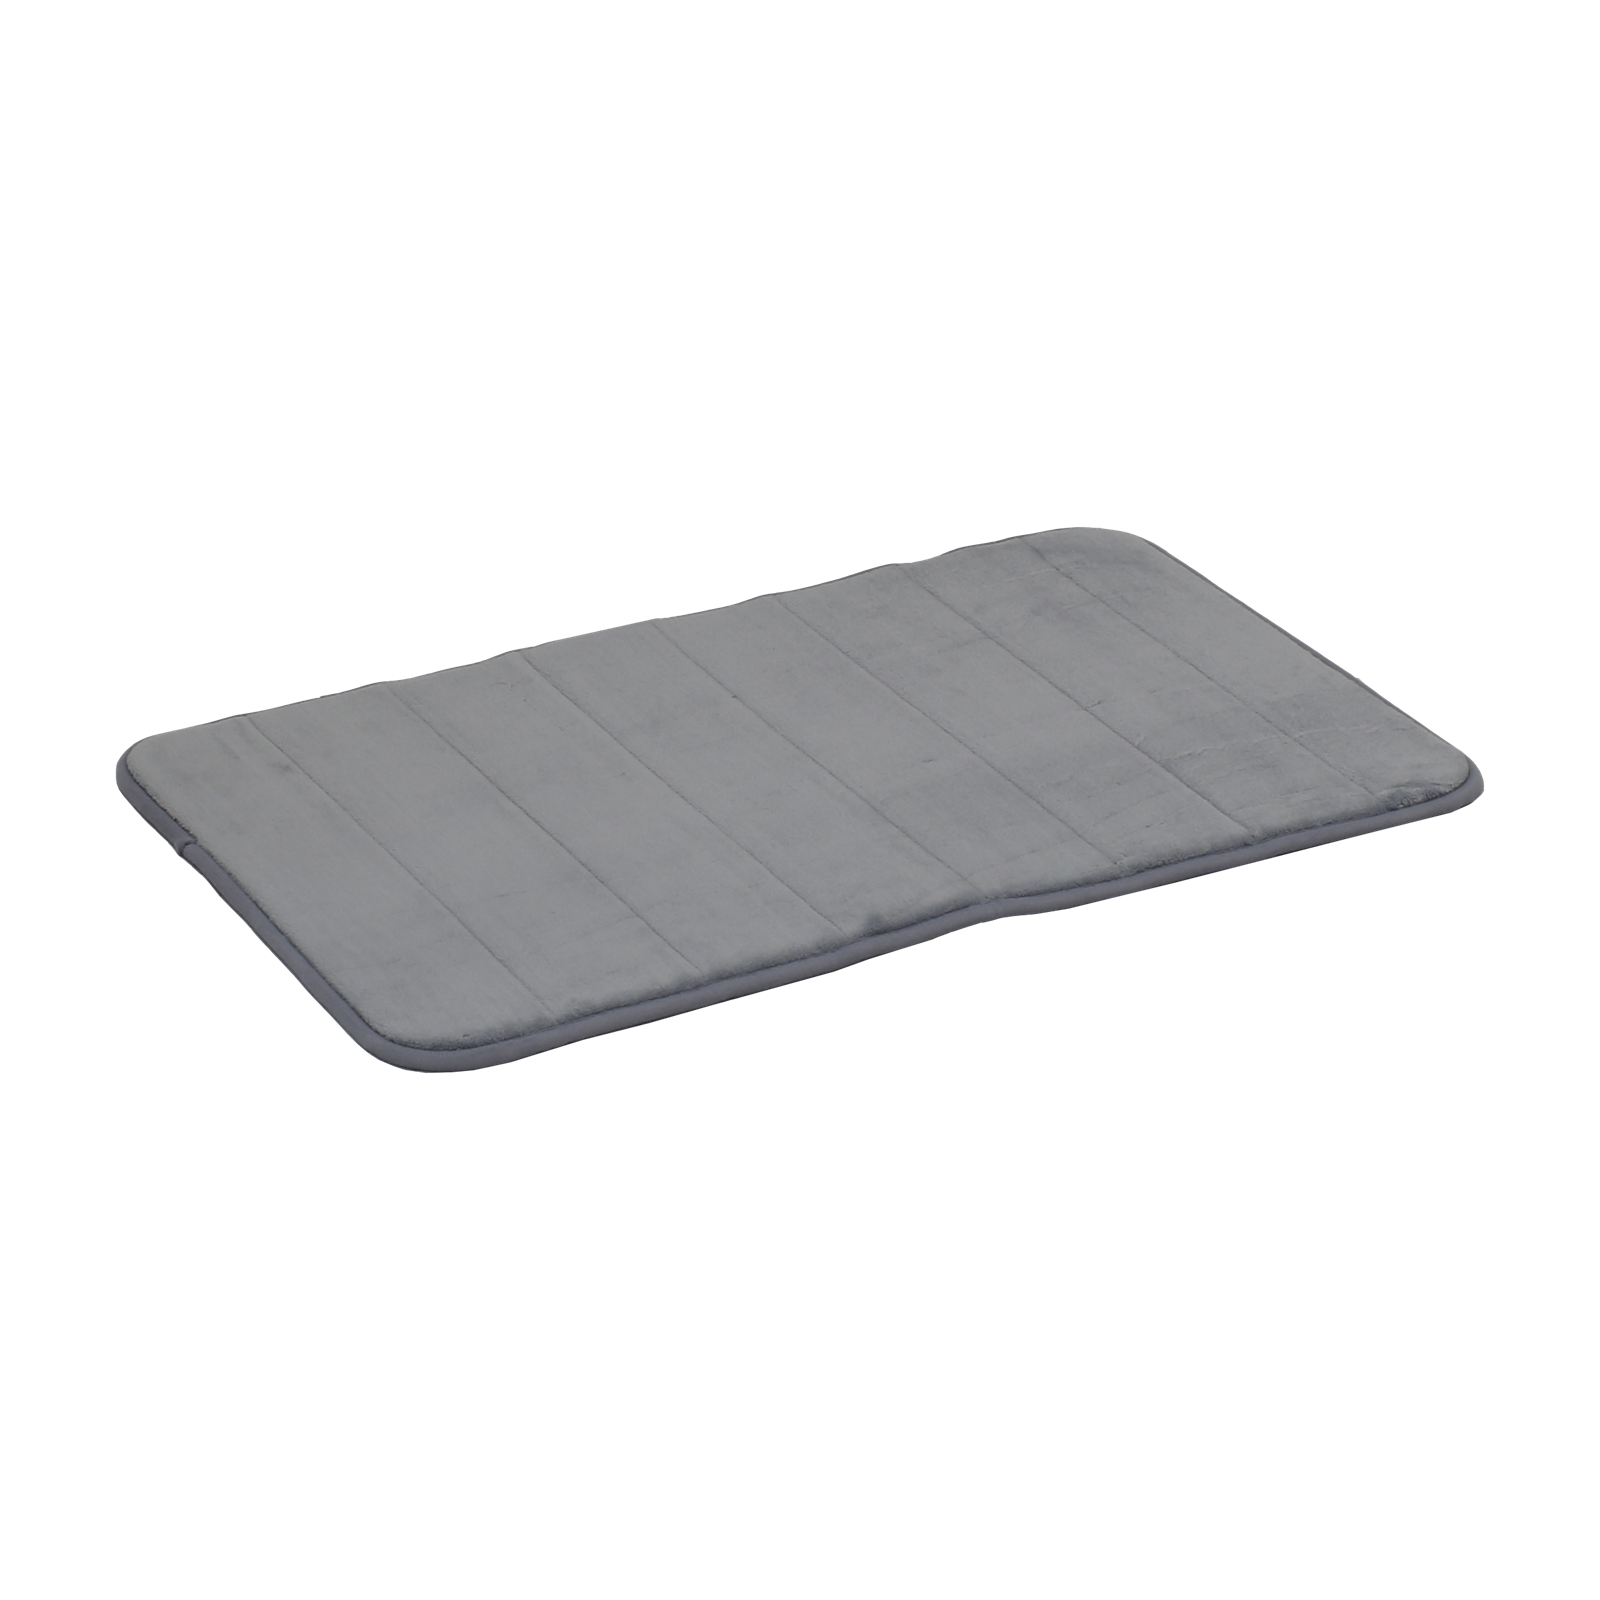 Softouch 800 x 500mm Grey Monarch Memory Foam Bathmat